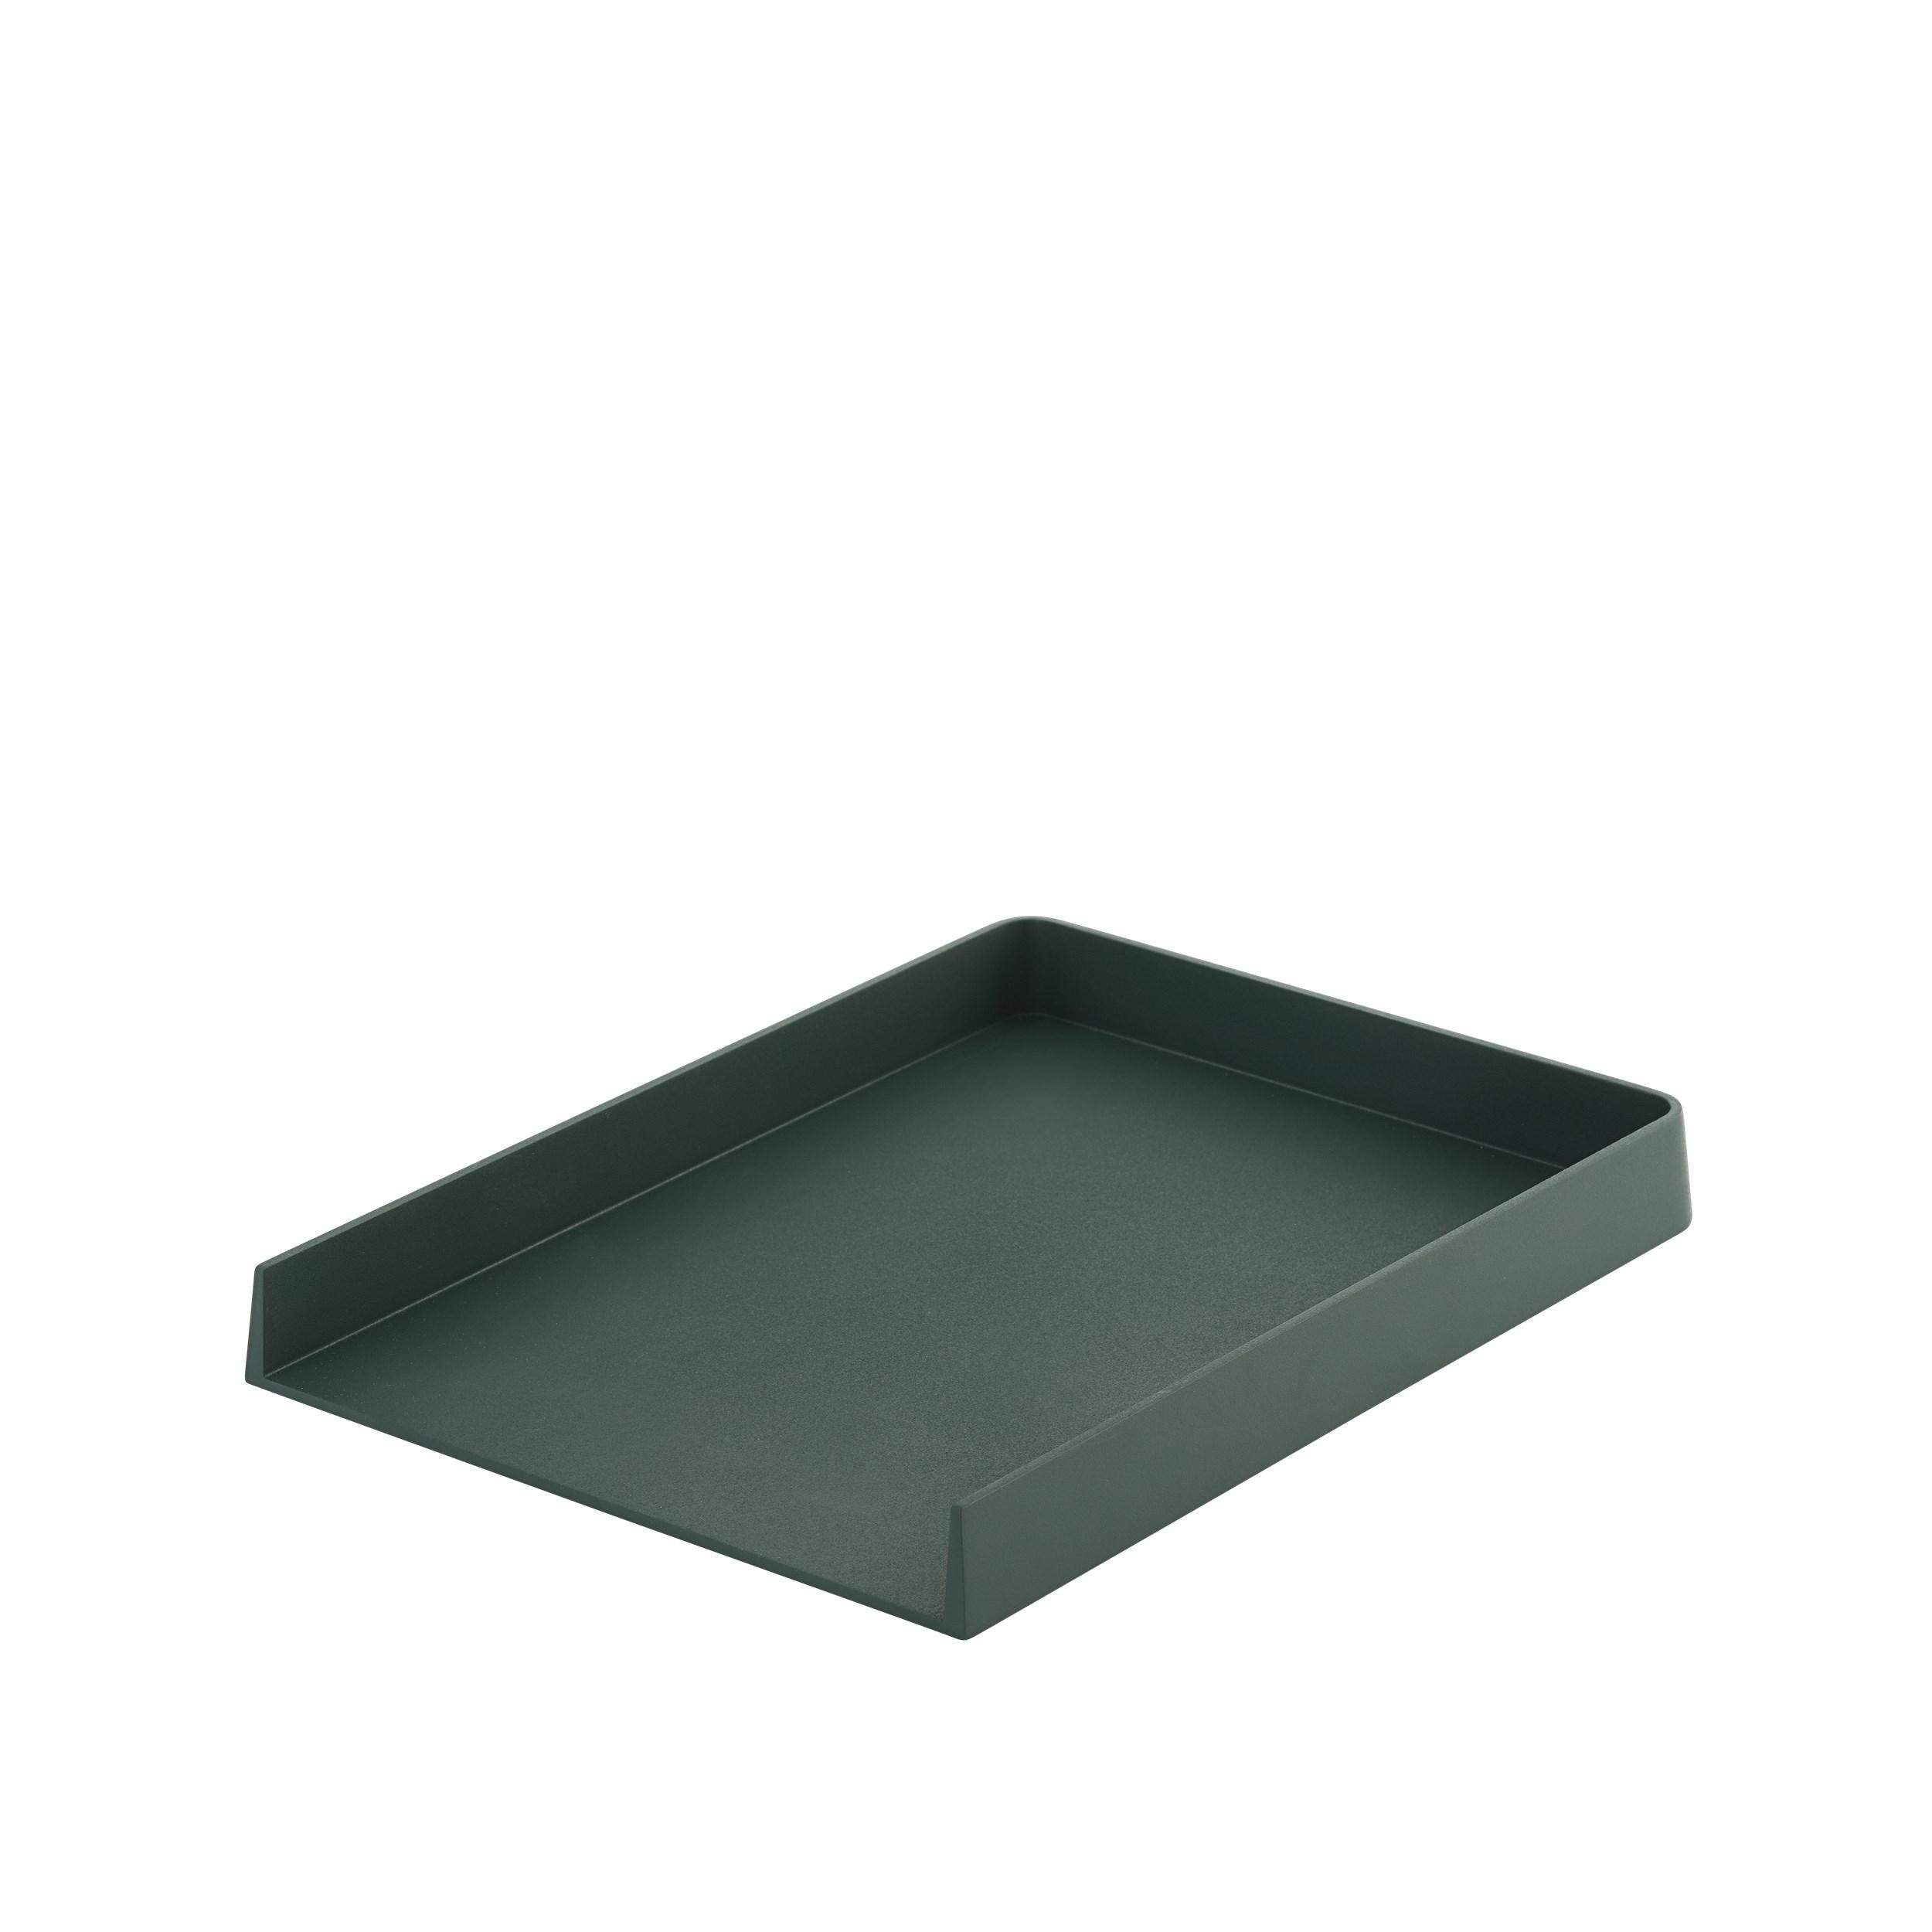 Muuto Arrange Tray 32x25 Dark Green